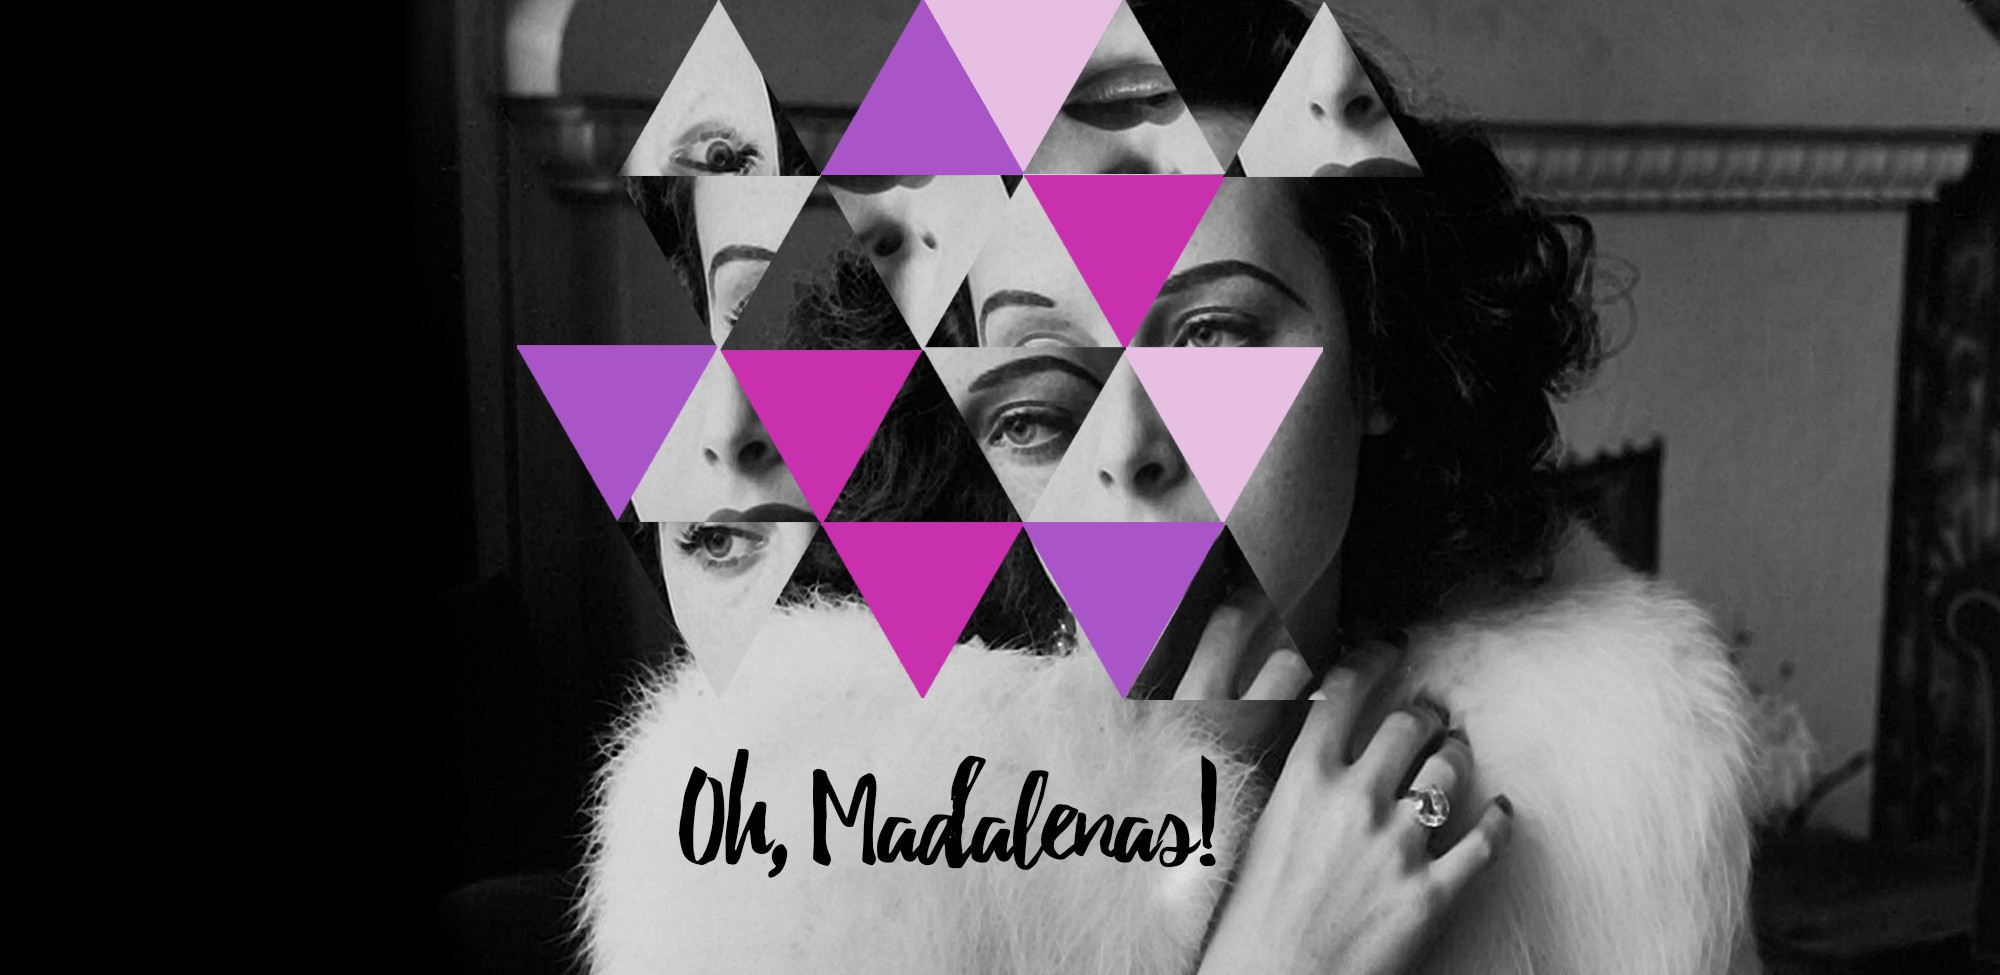 Oh, Madalenas!